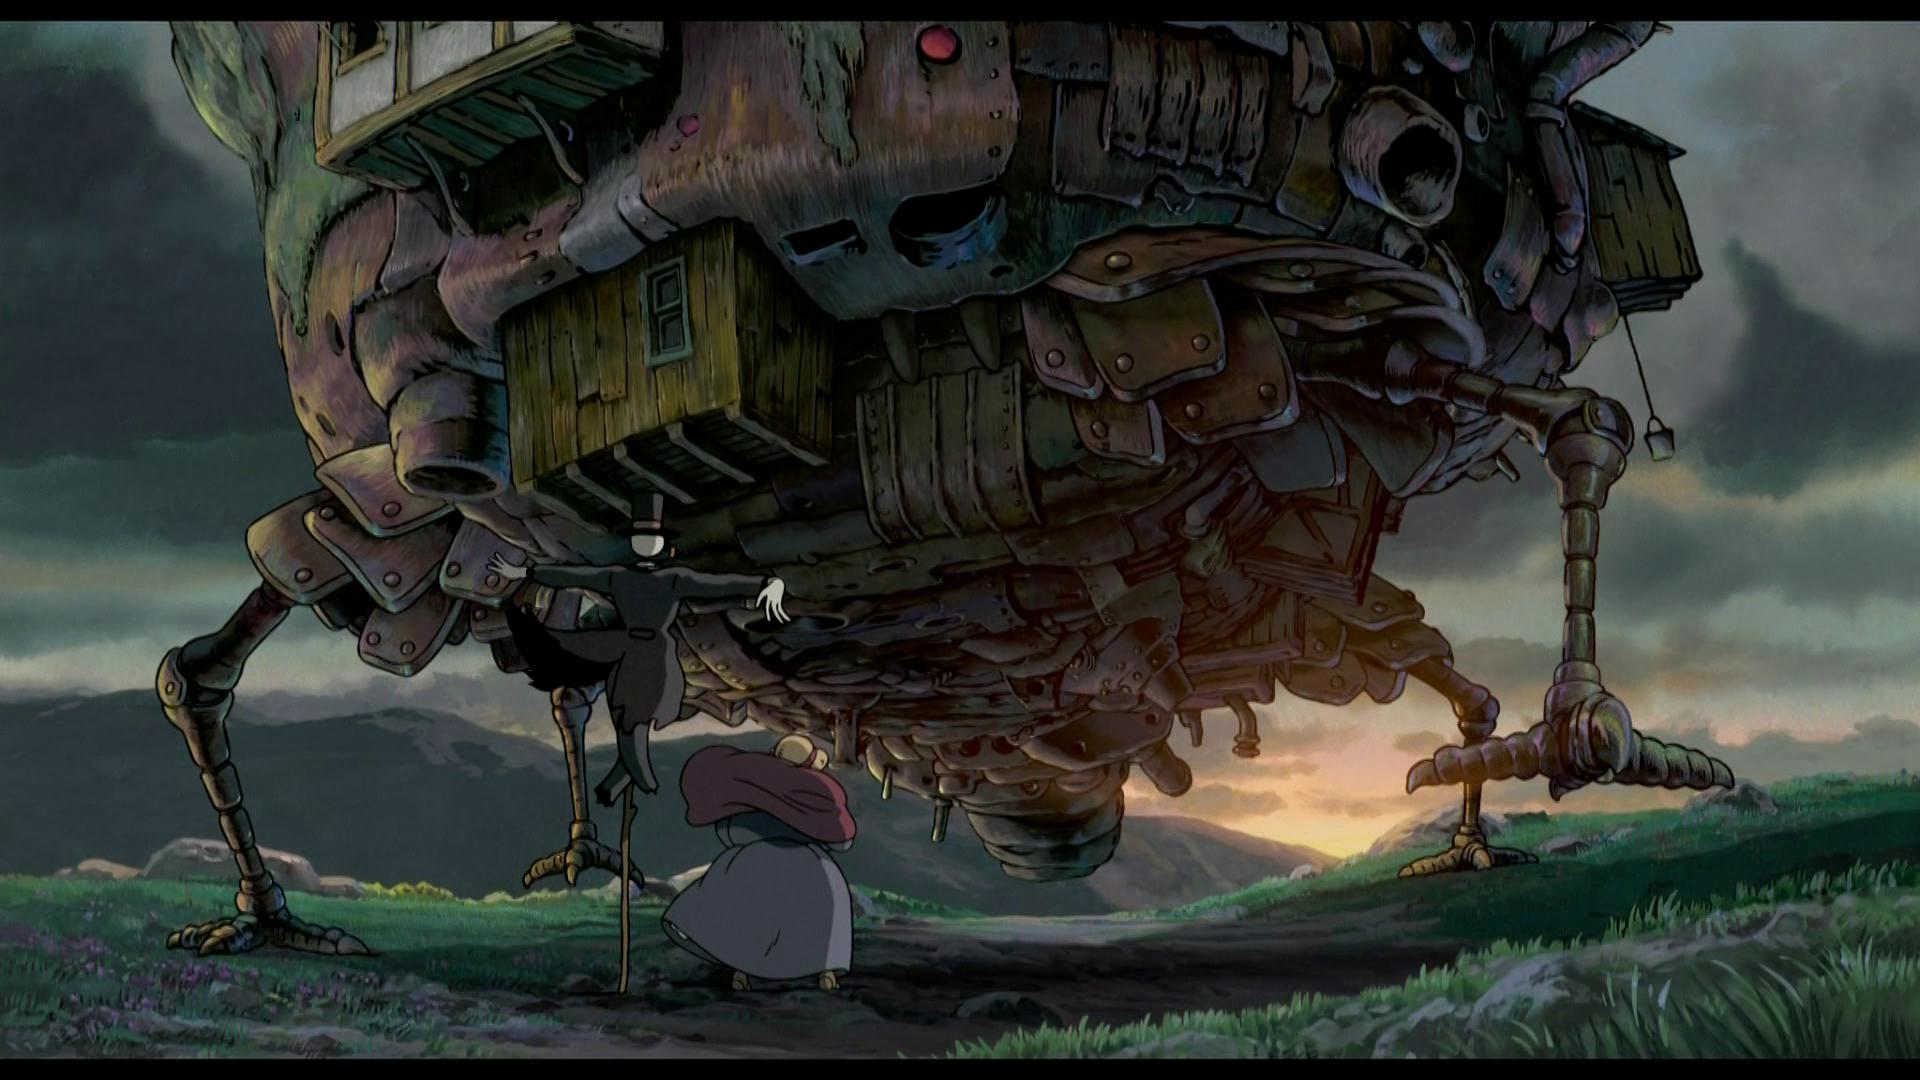 Hayao Miyazaki Studio Ghibli Howls Moving Castle